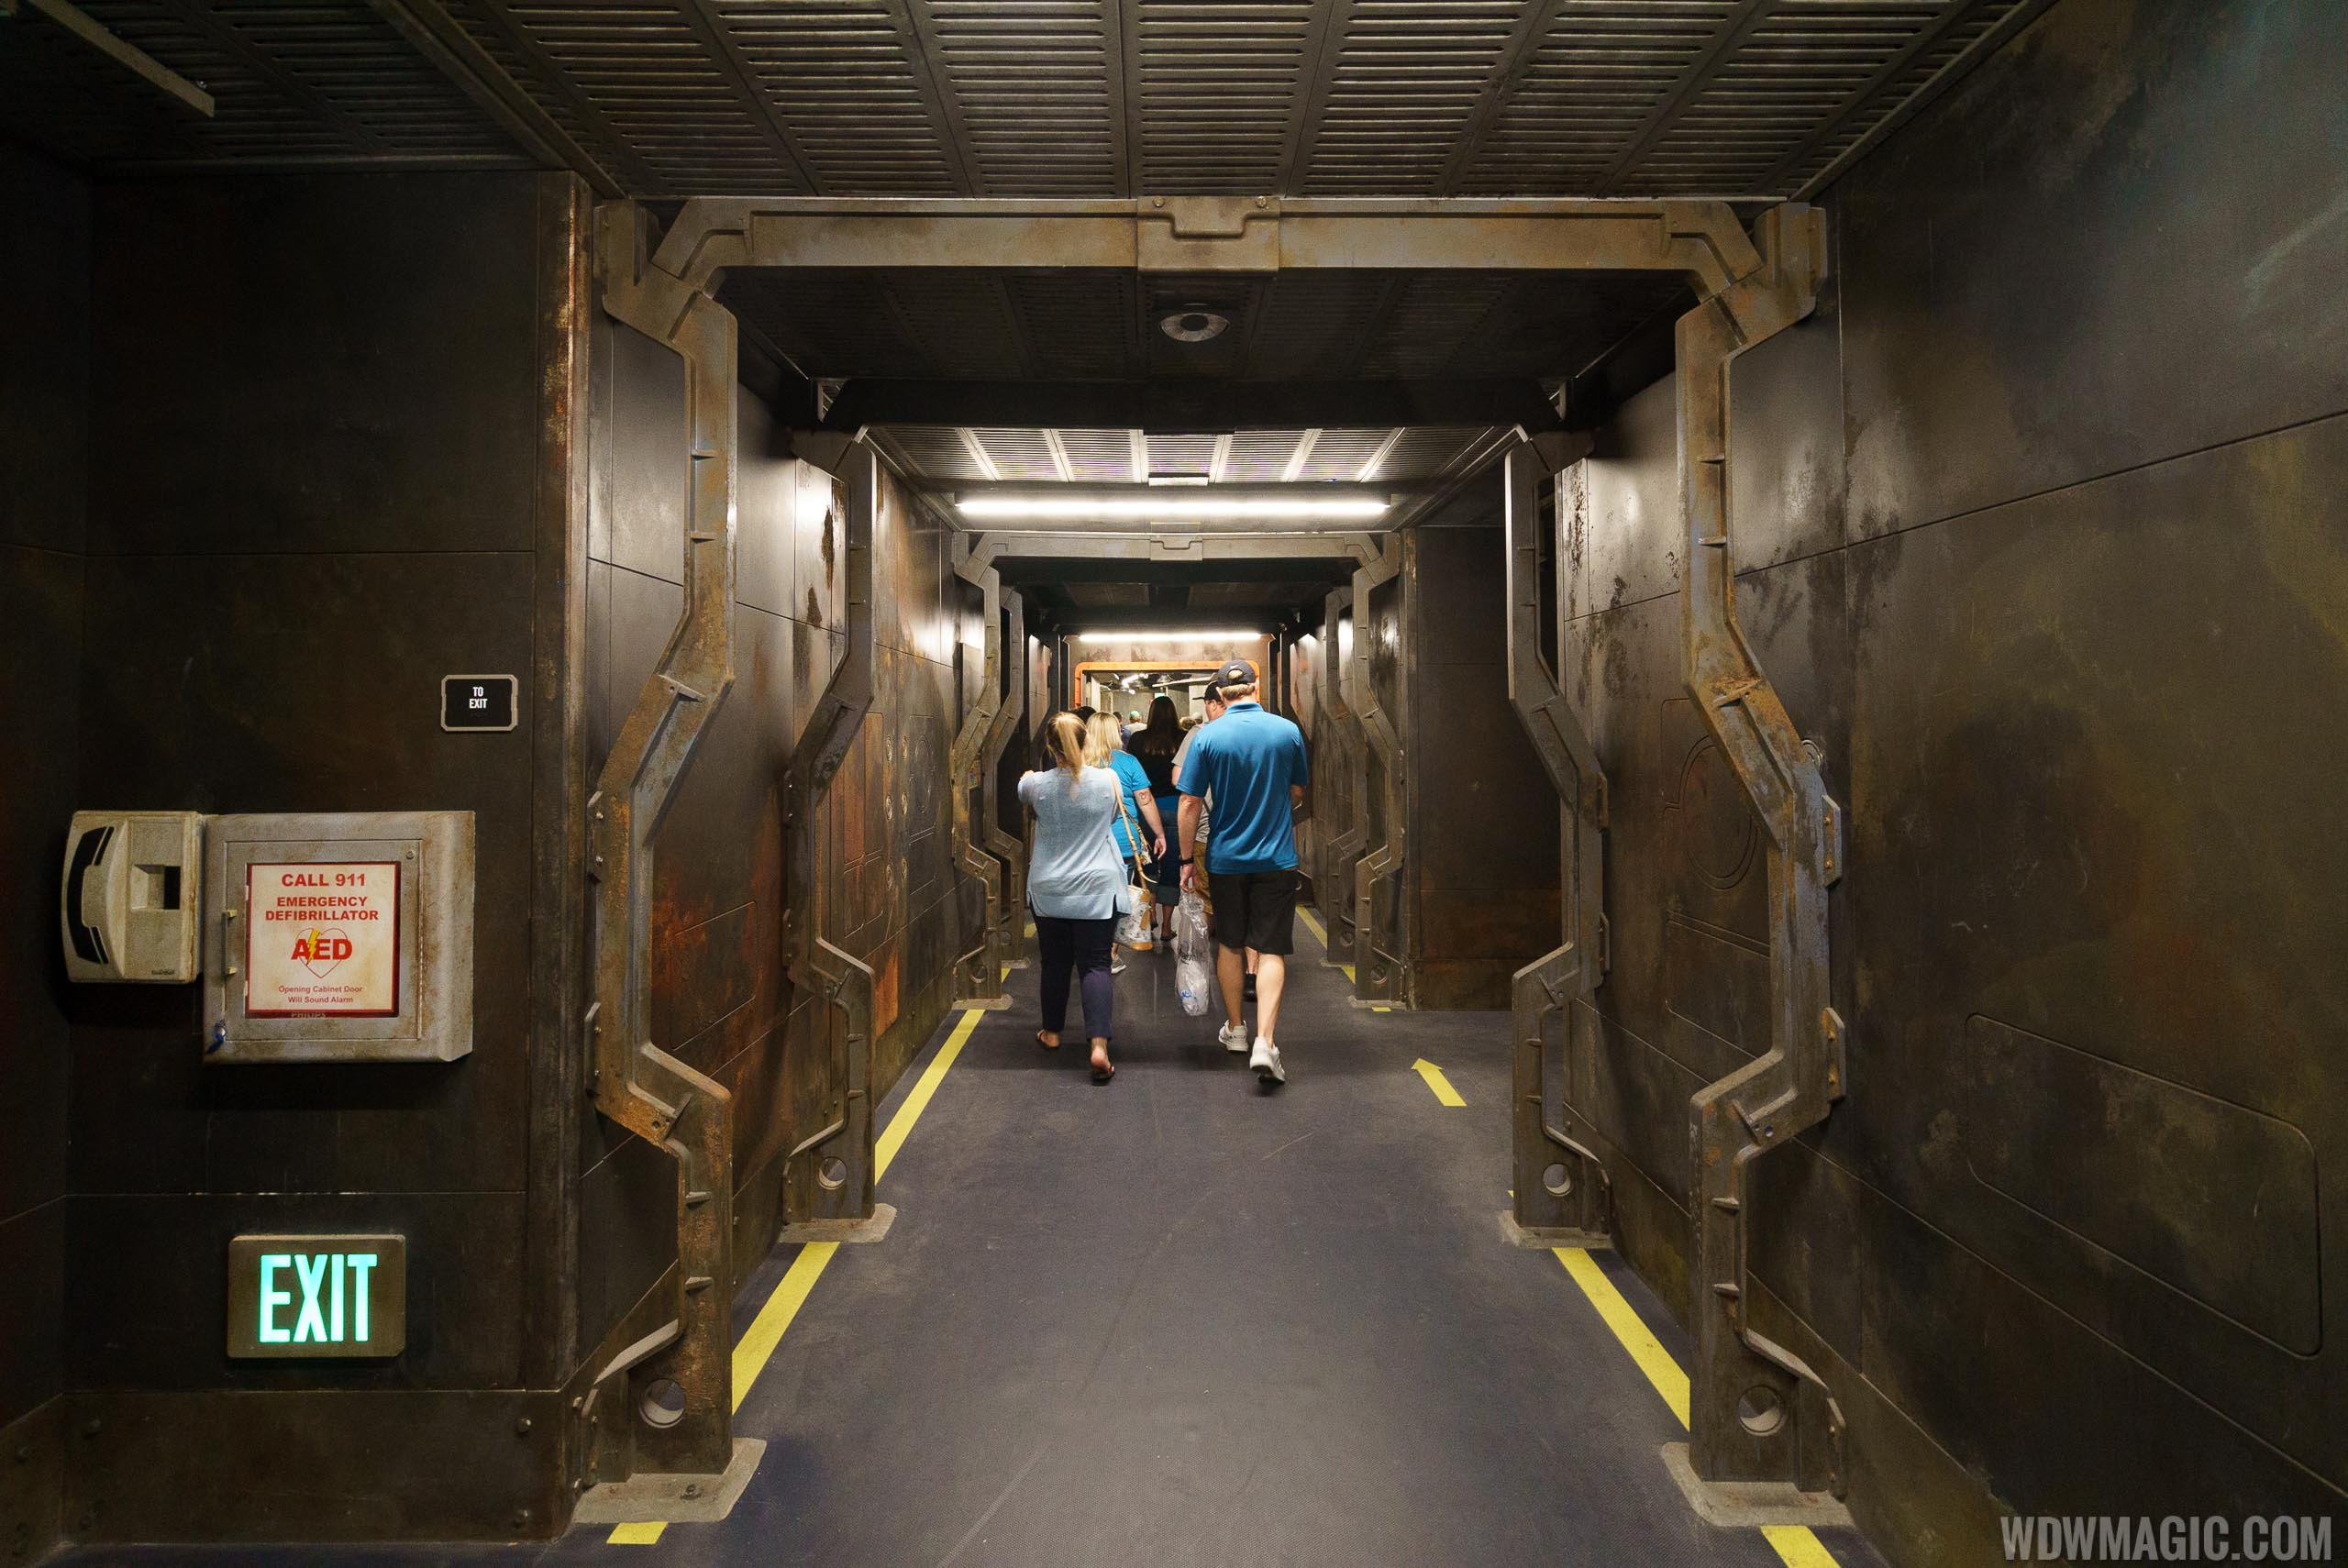 Avatar Flight of Passage - Exit corridor